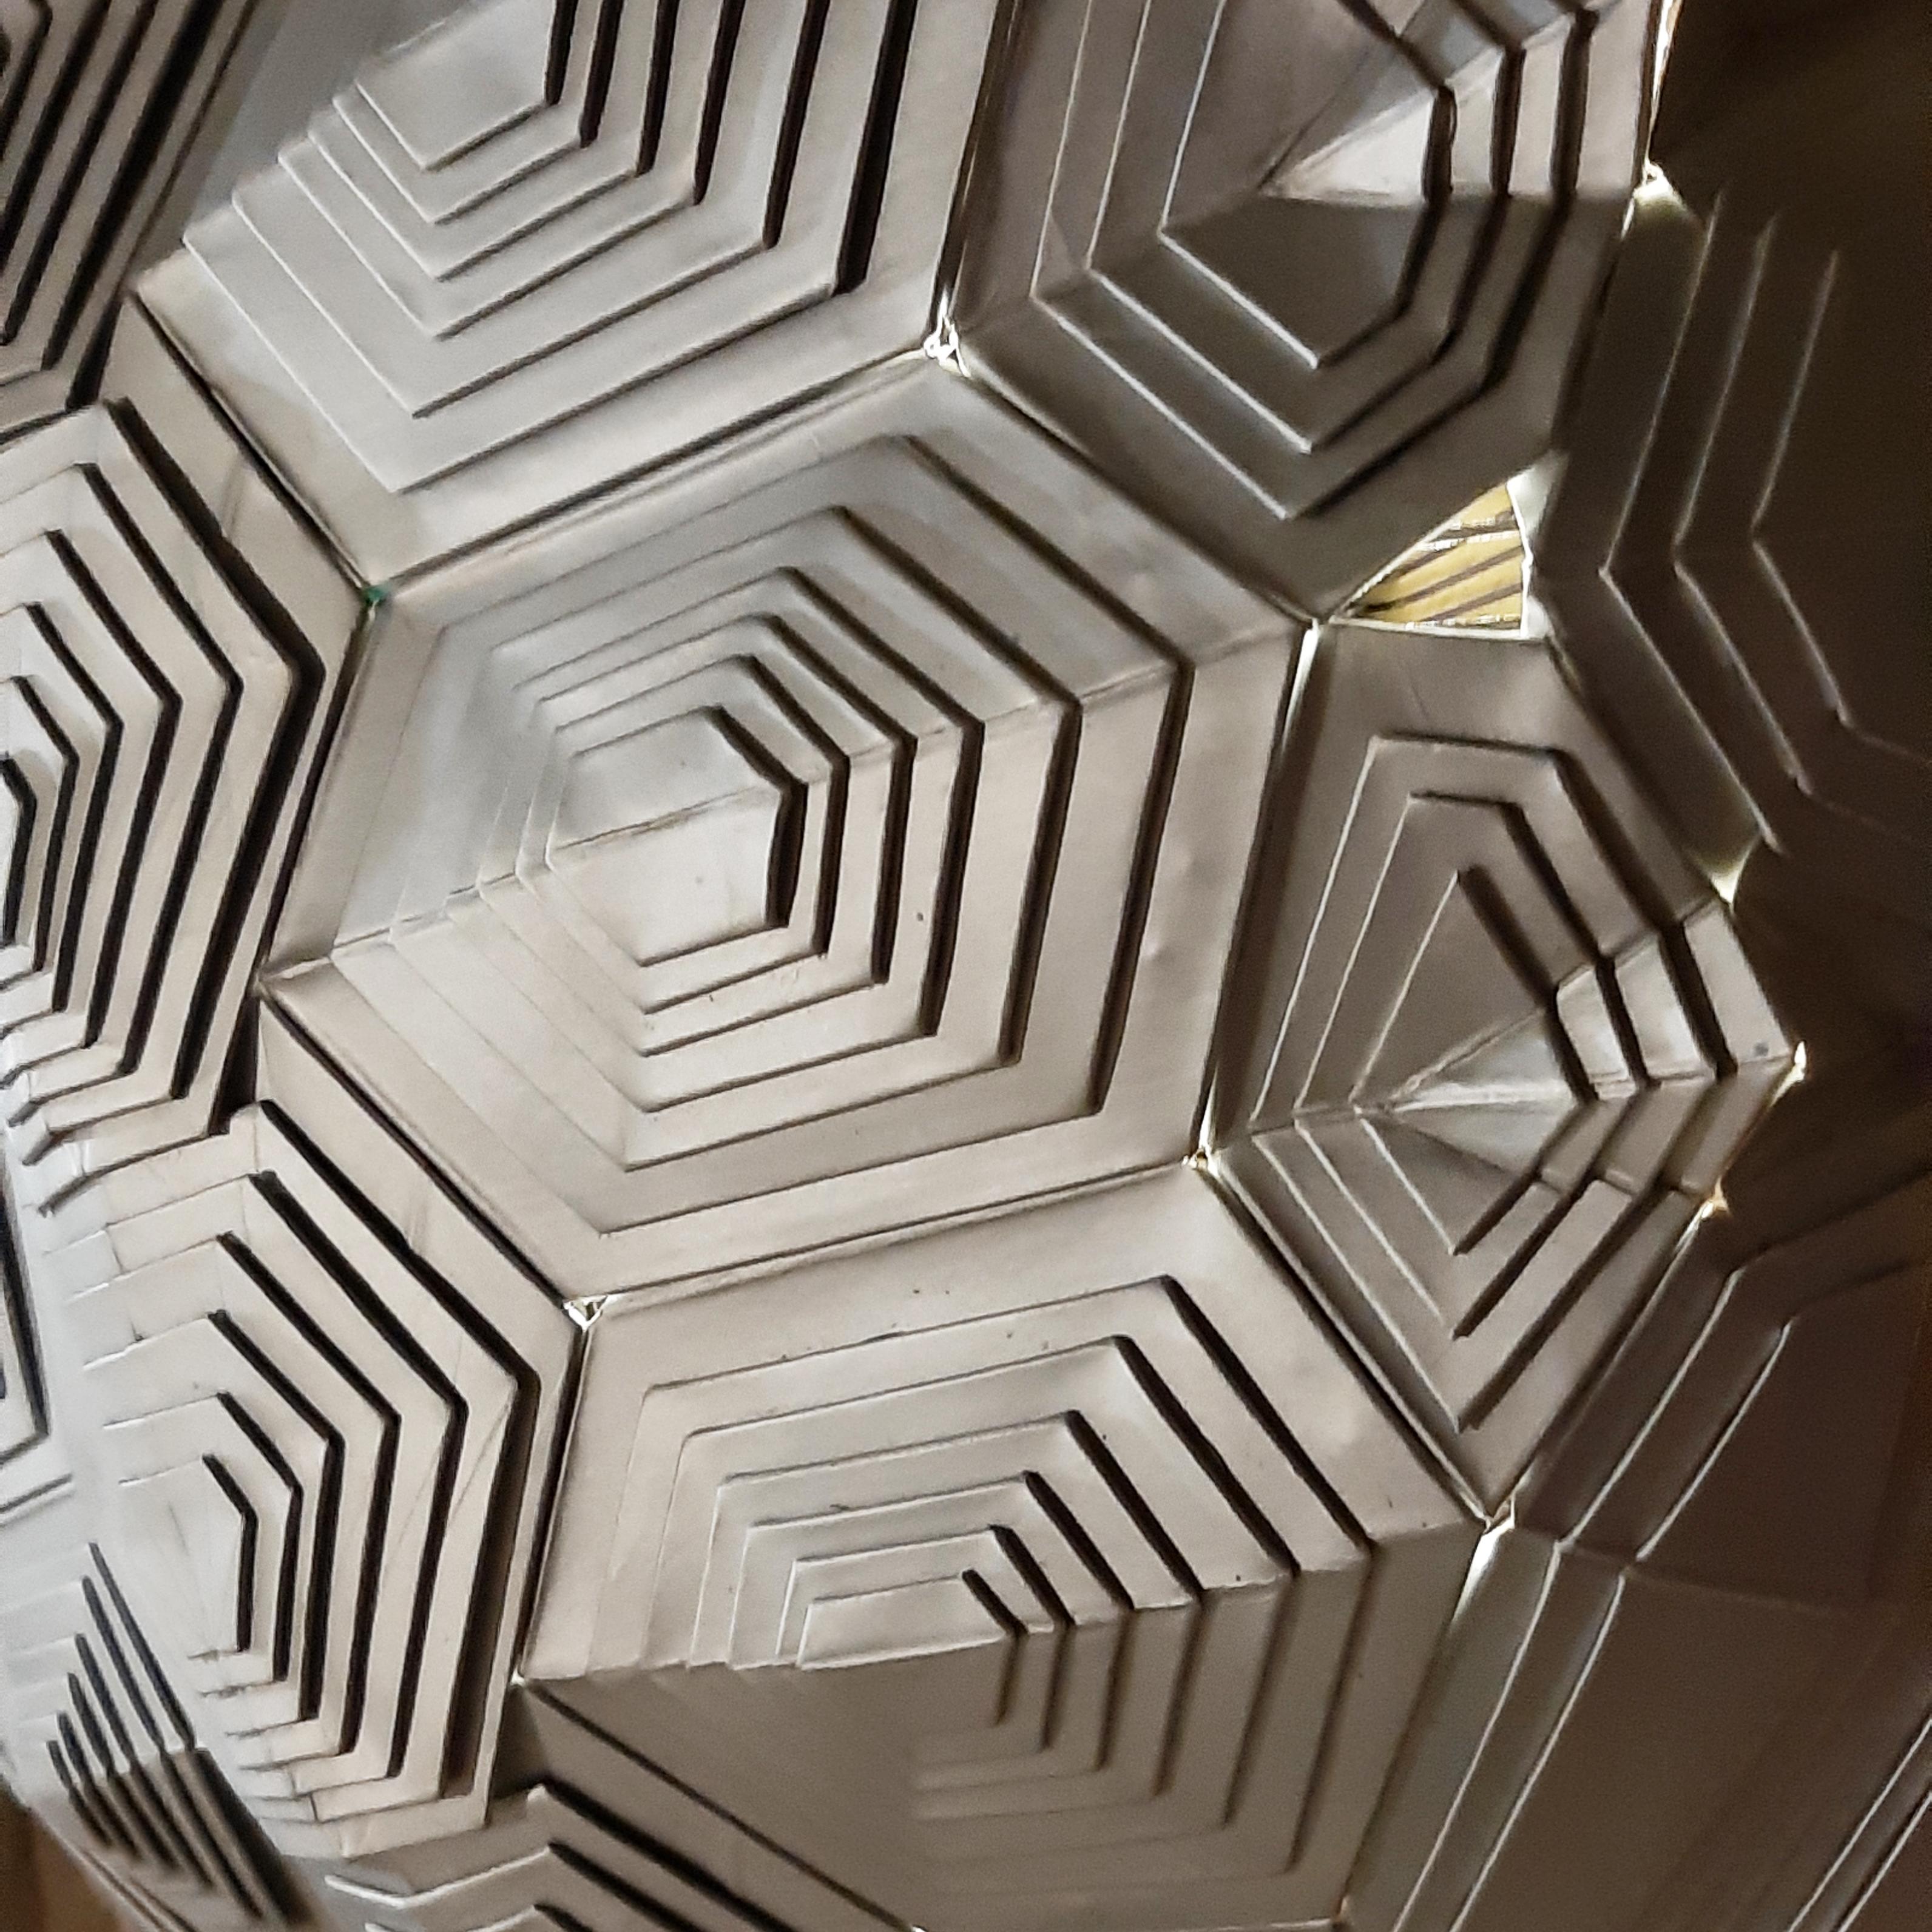 Tetraruga -detalhe